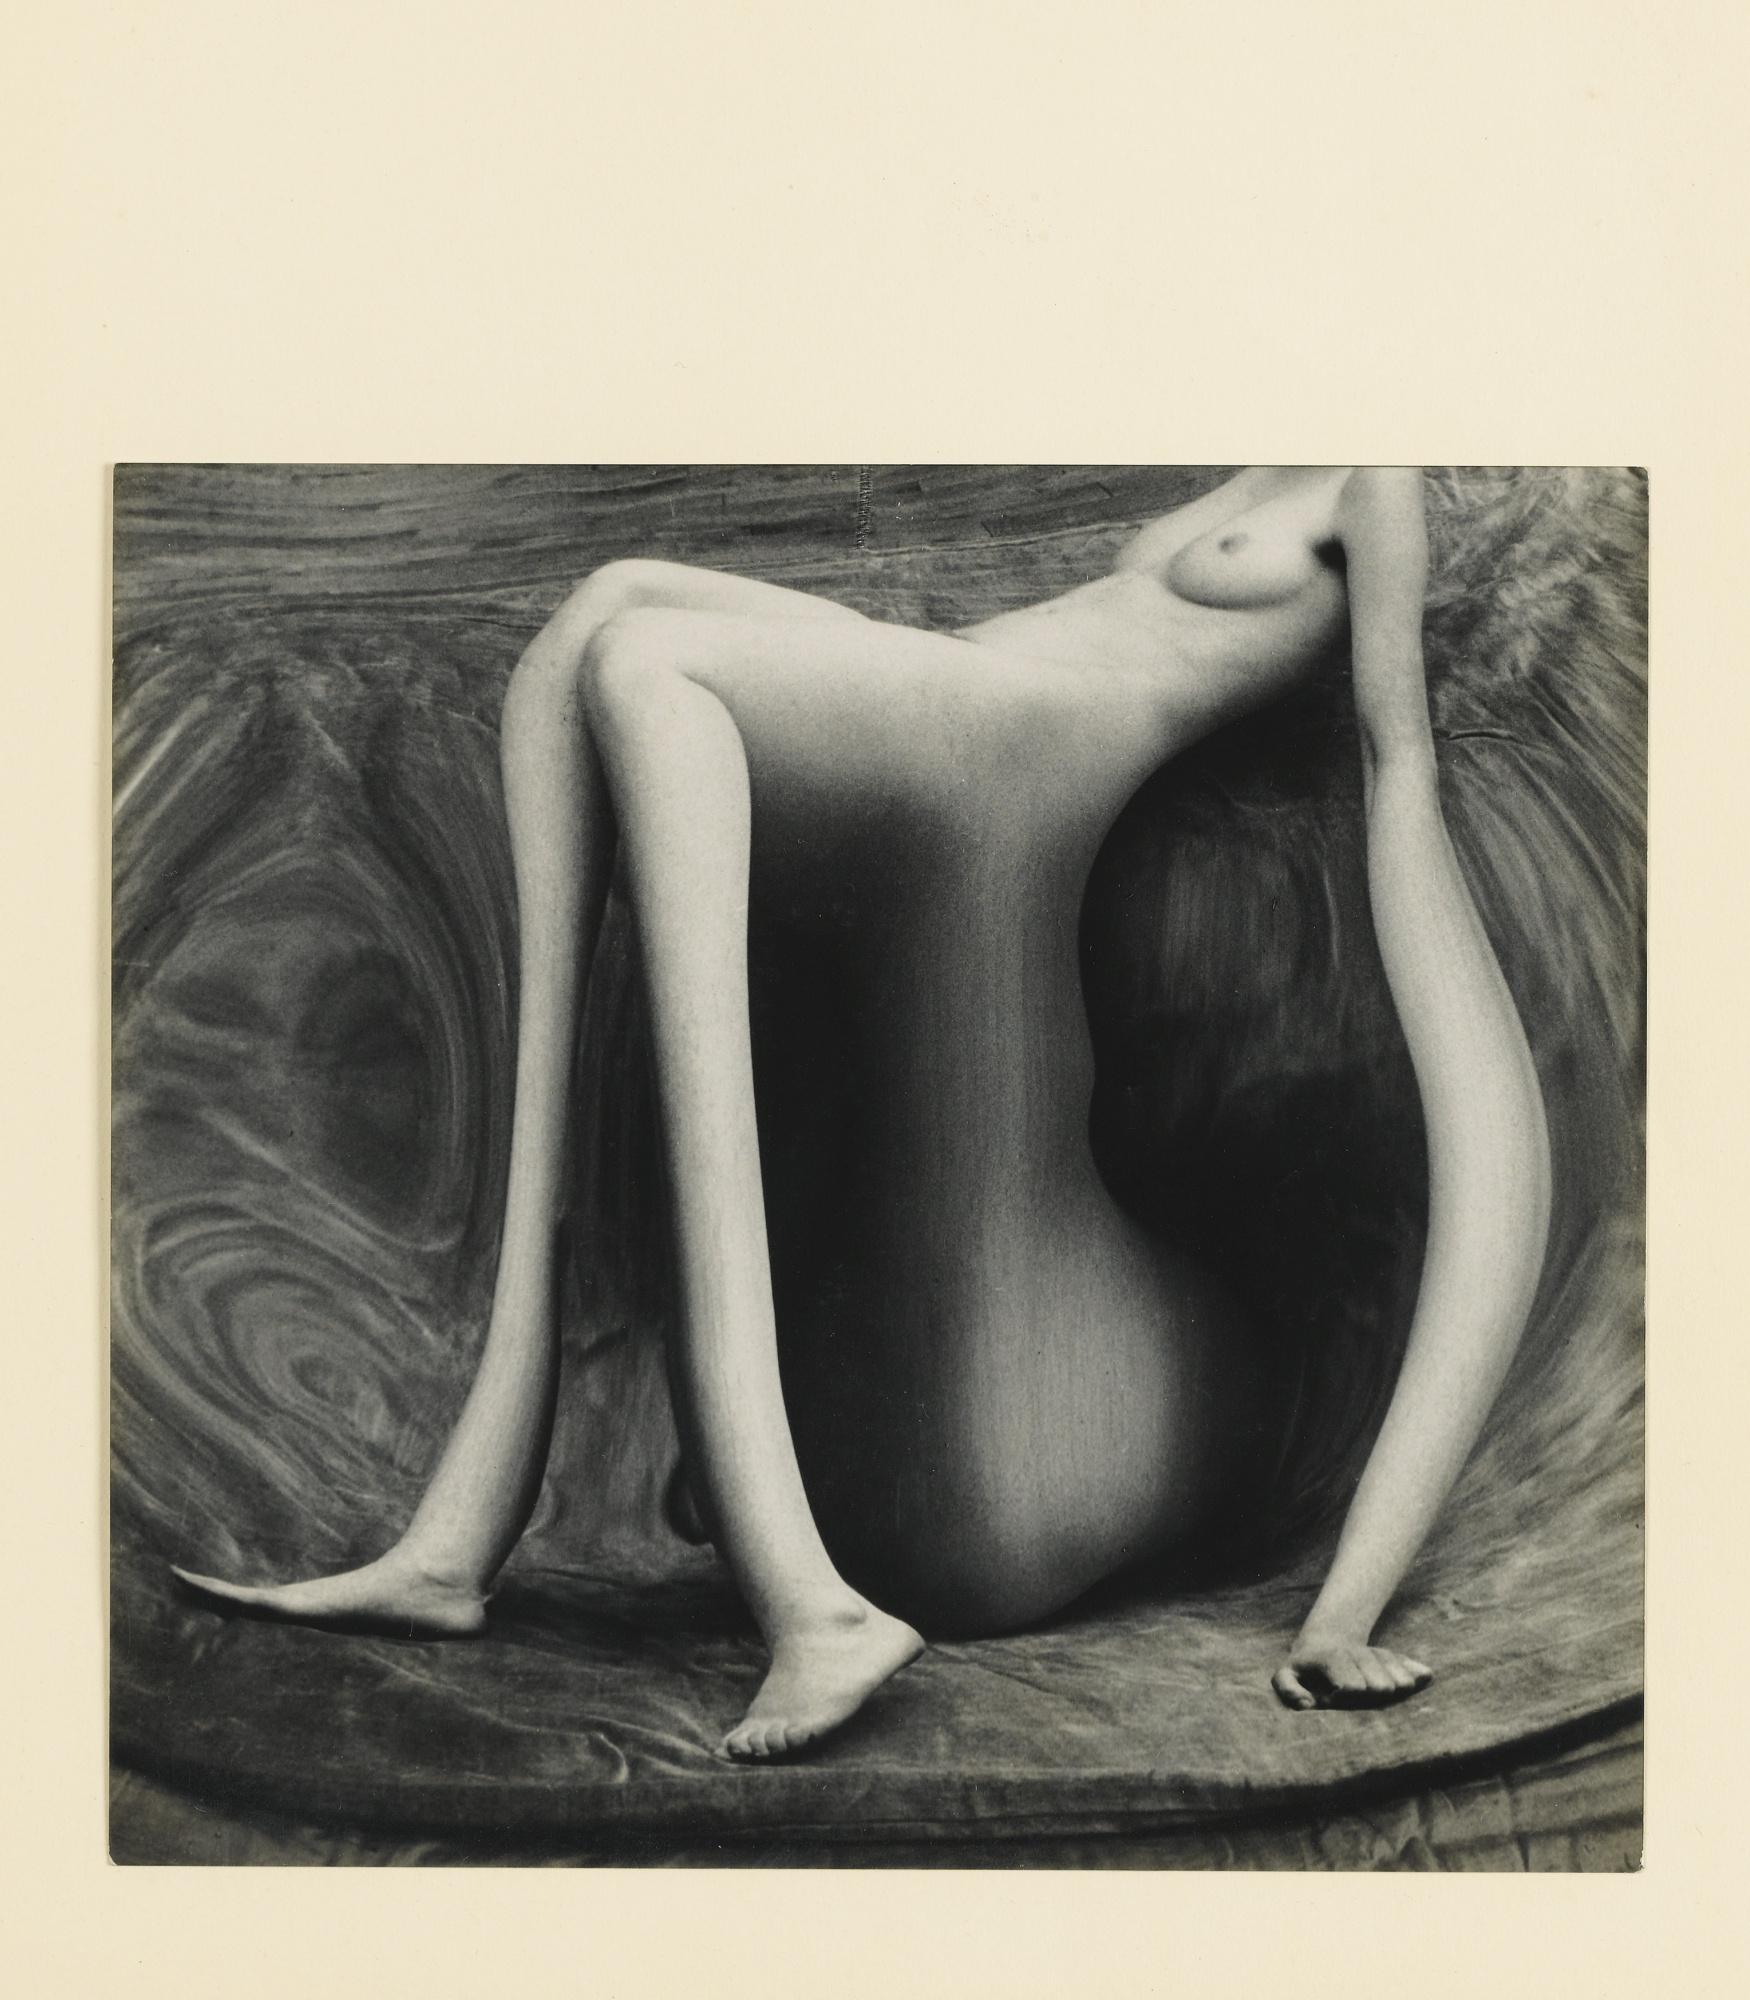 Andre Kertesz-Distortion #141-1933